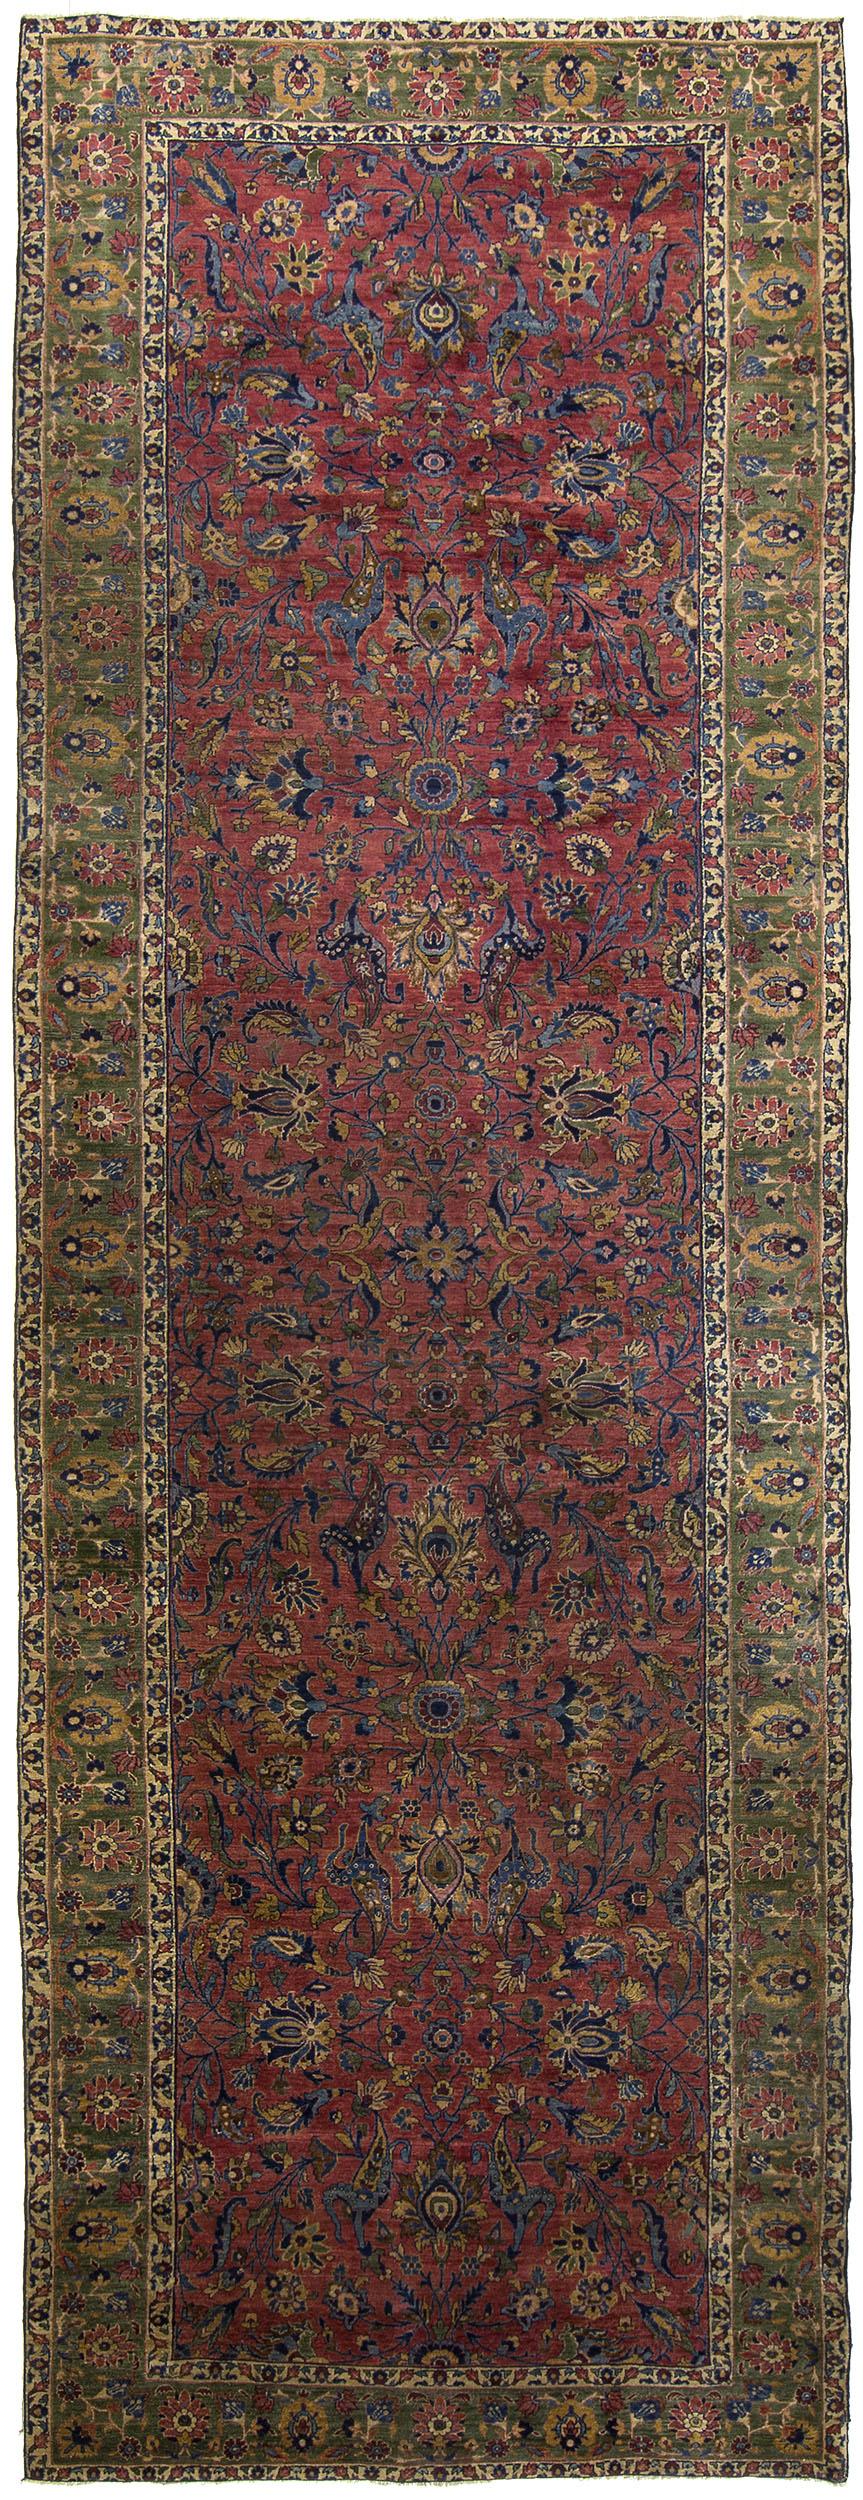 "Sarouk Gallery Carpet 18' 0"" x 6' 0"""